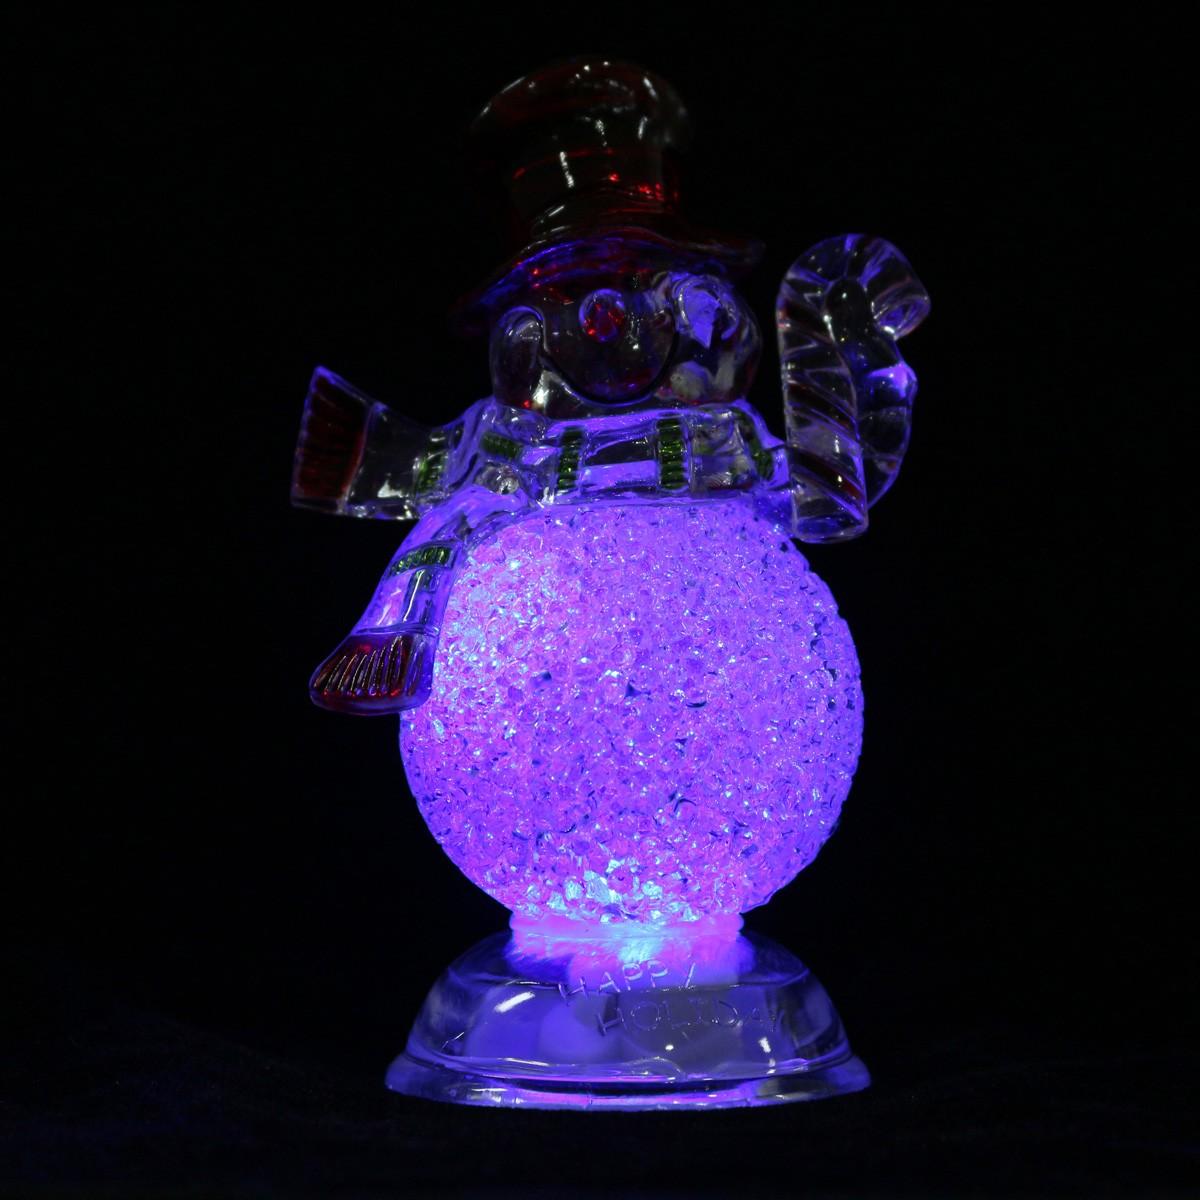 Acrylic Christmas Xmas Transparent Snowman LED Light Color Changing Home Decor - Photo: 7